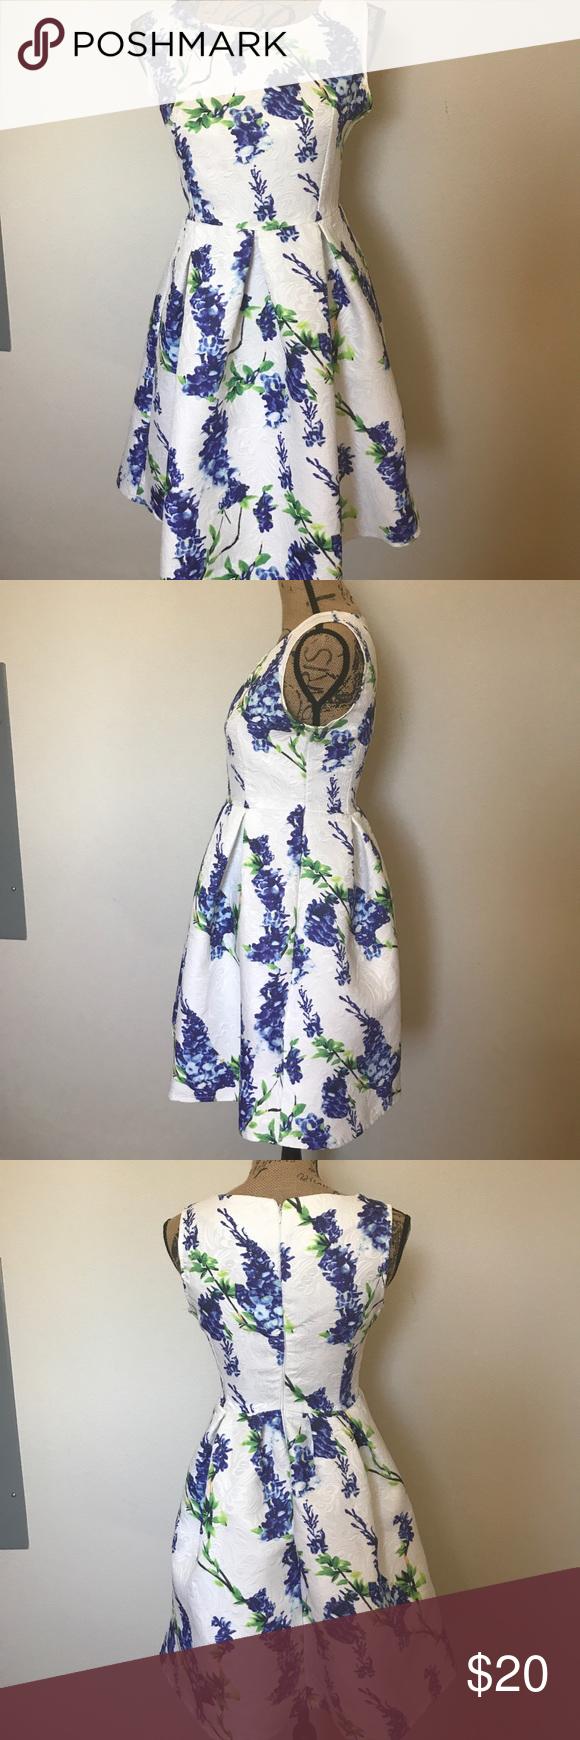 Euc minty gogo floral dress white floral dress floral and minis euc minty gogo floral dress izmirmasajfo